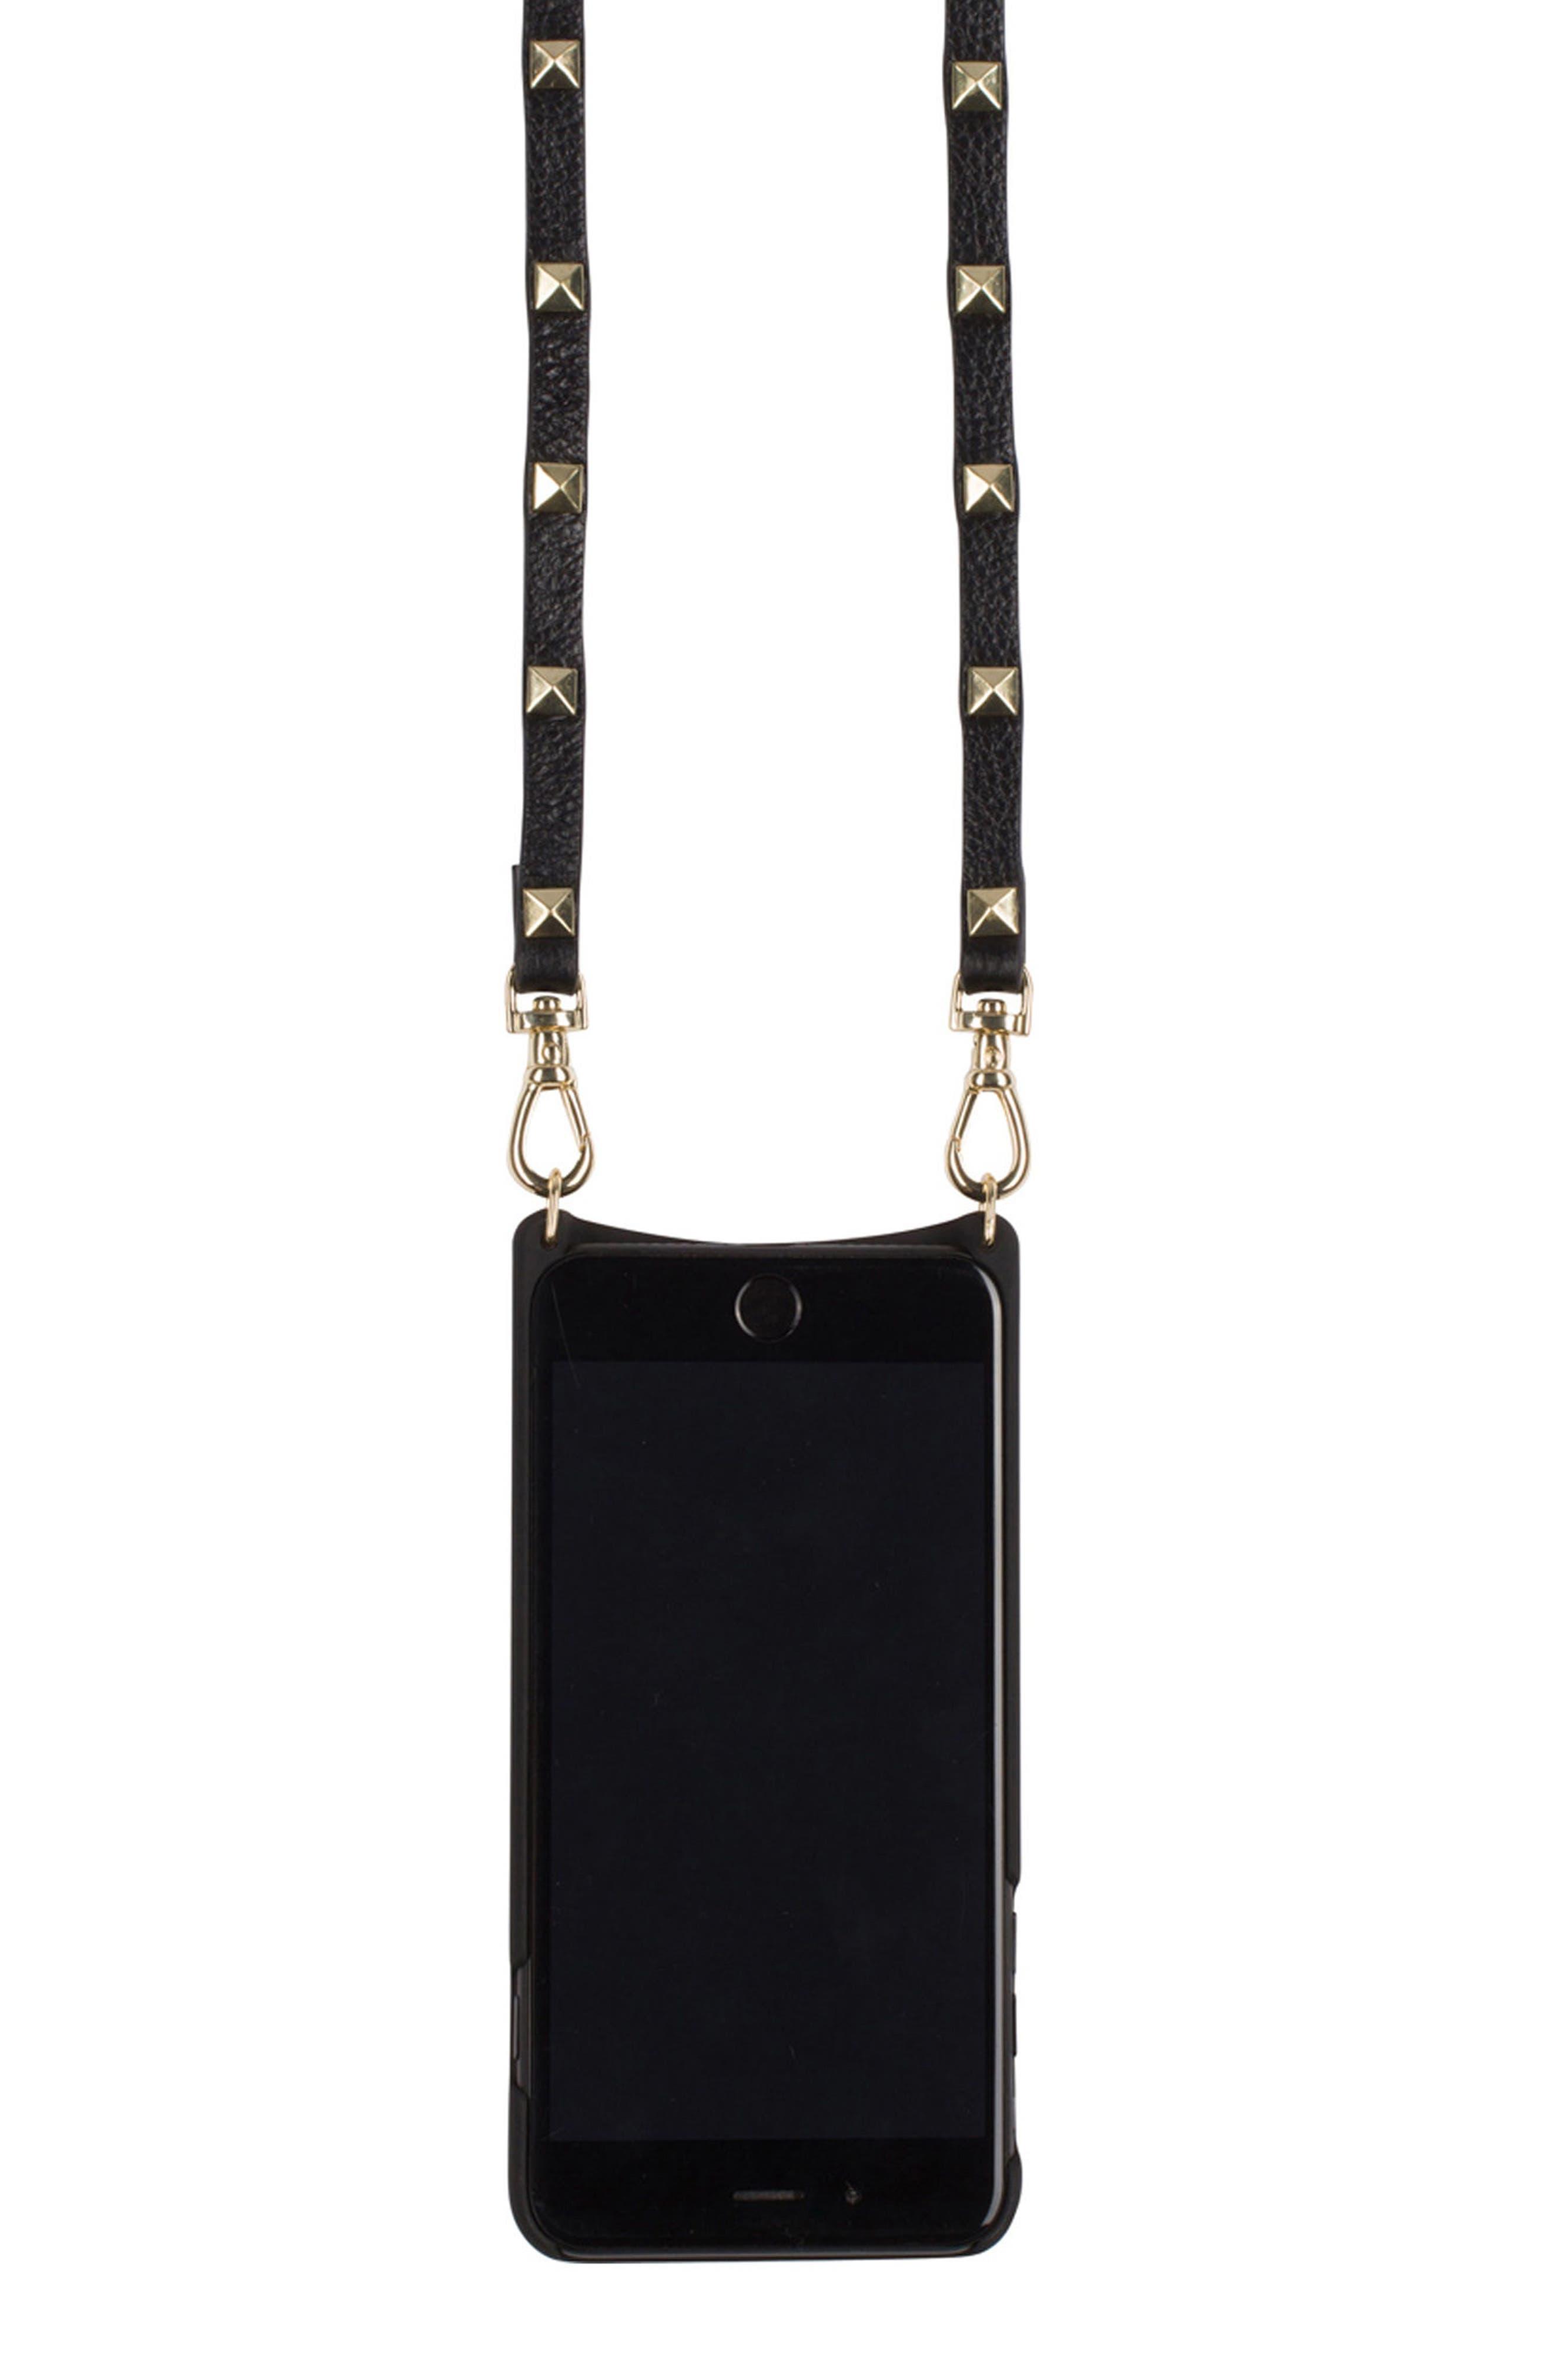 Sarah Leather iPhone 6/7/8 & 6/7/8 Plus Crossbody Case,                             Alternate thumbnail 2, color,                             New Black/ Gold